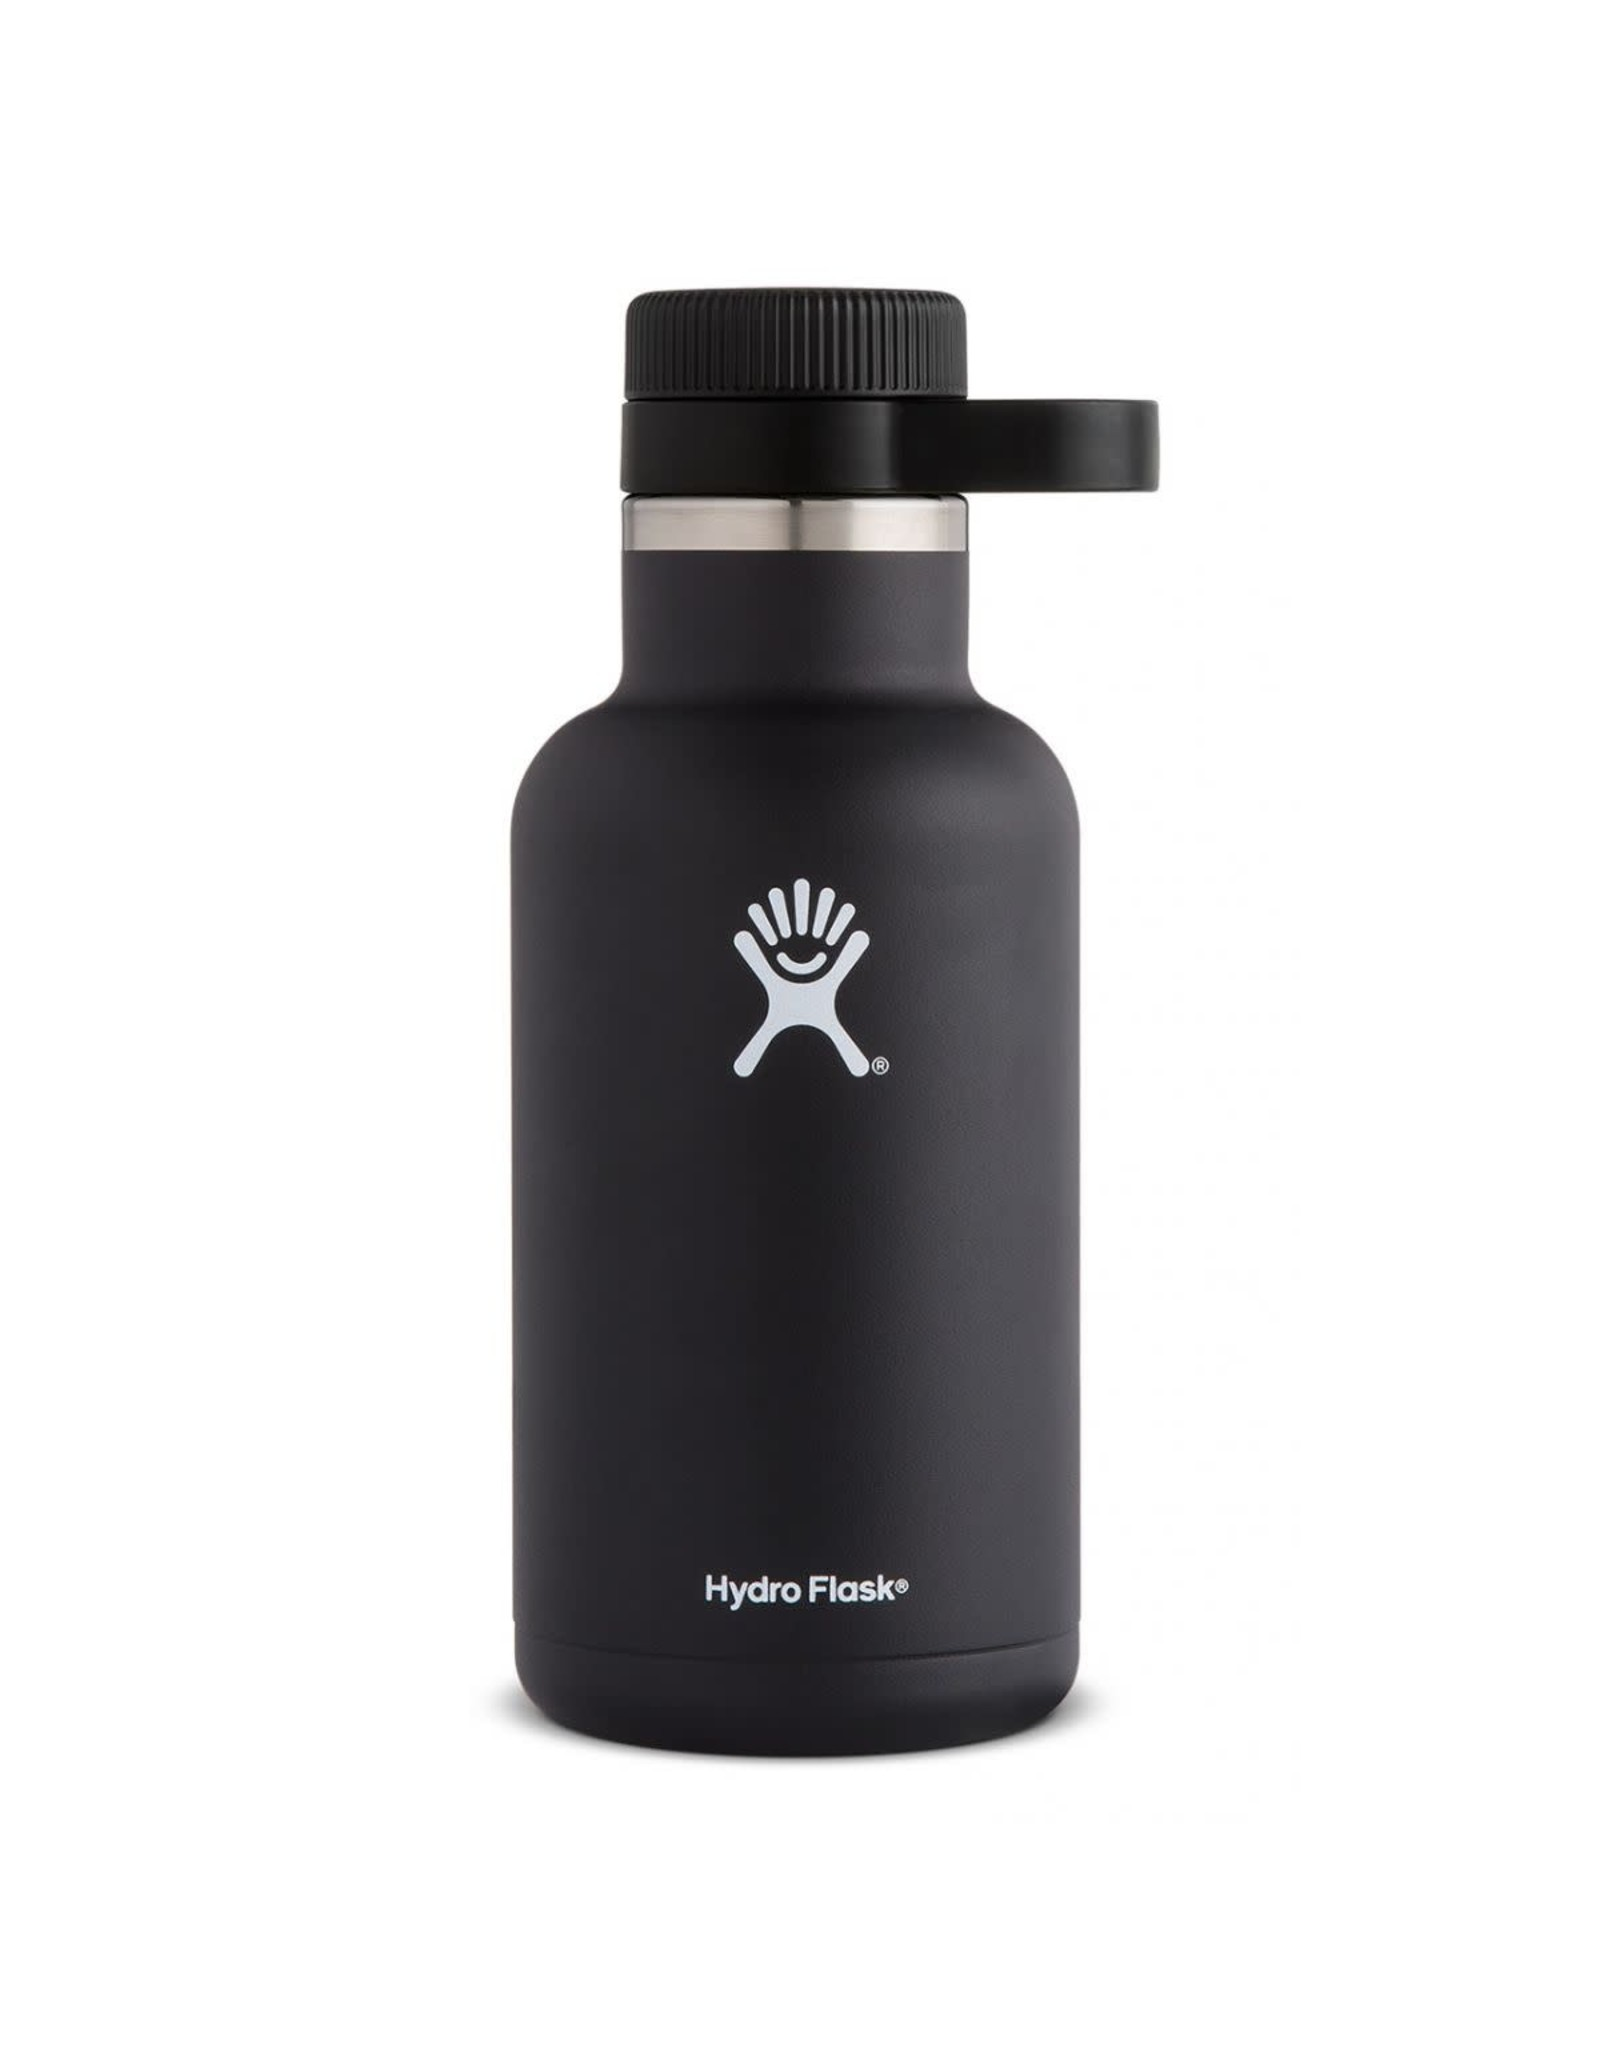 Hydro Flask Hydro Flask Growler 64oz